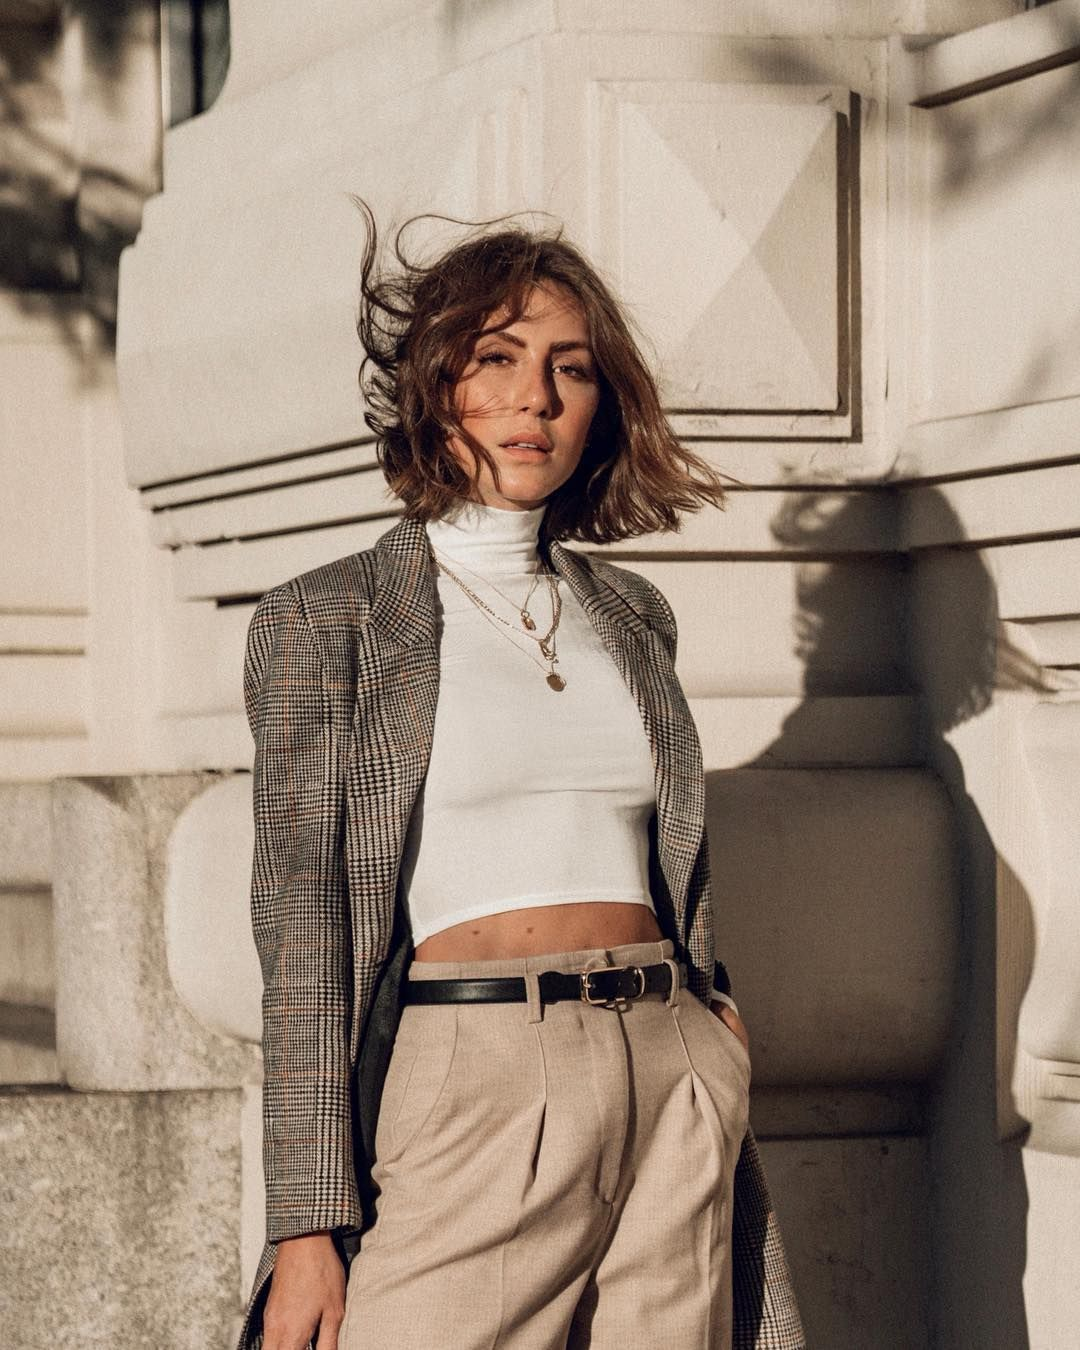 2019 Jelena Cikoja nude photos 2019